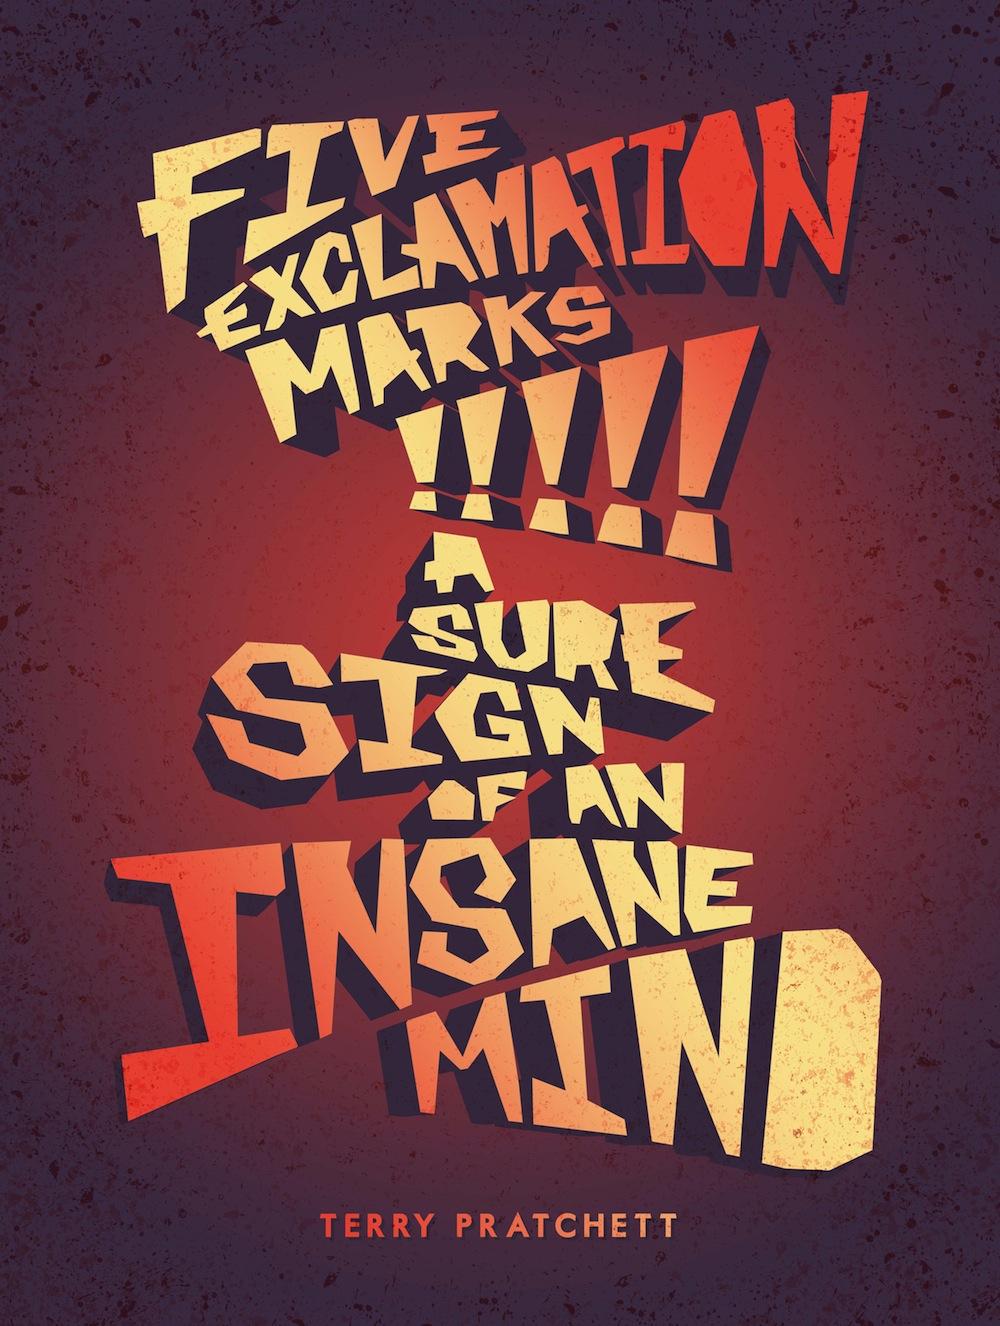 fiveexclamation3.jpg